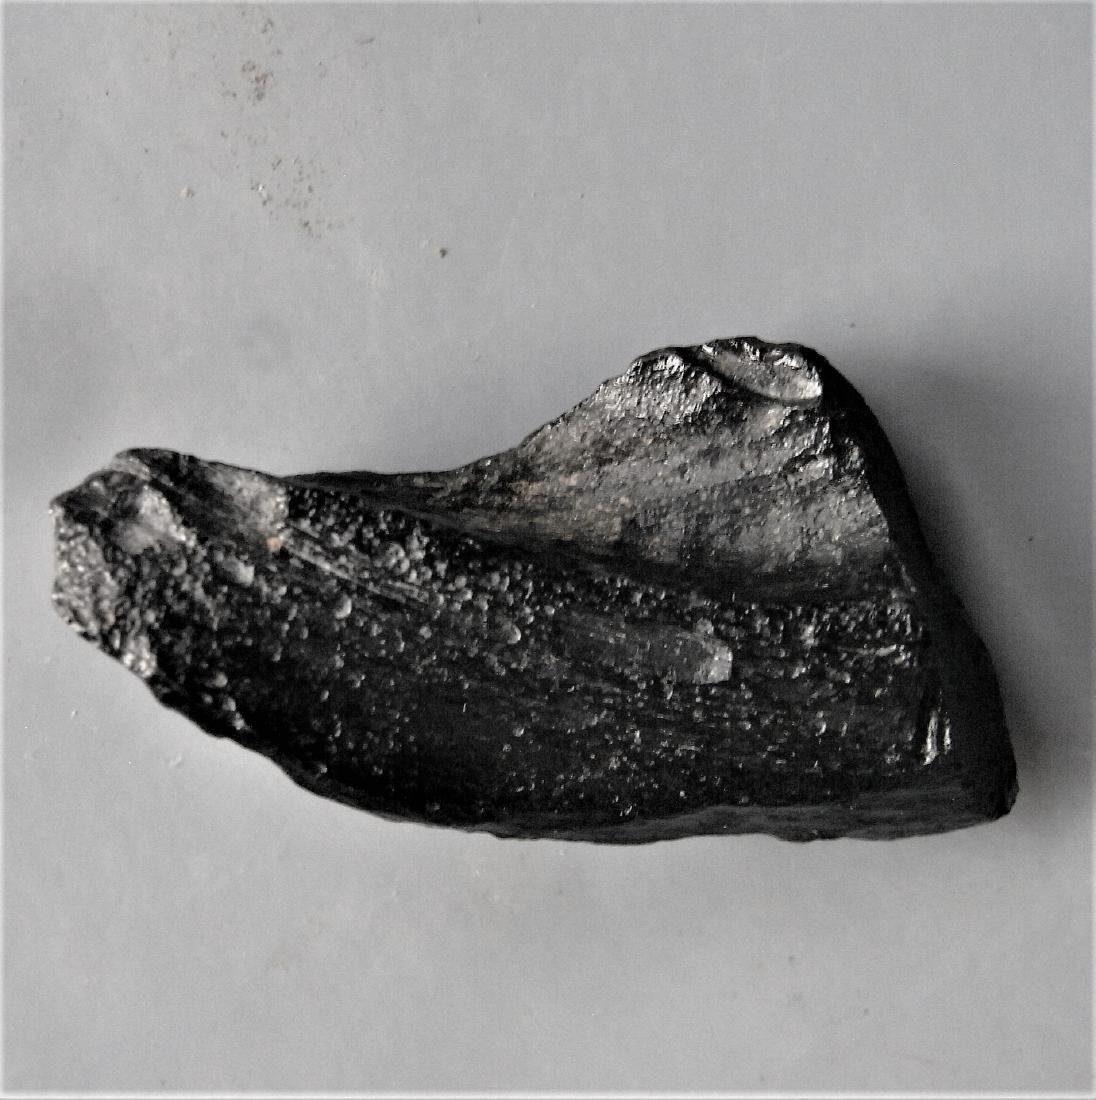 THAILANDITE TEKTITE FROM METEORITE IMPACT - 2